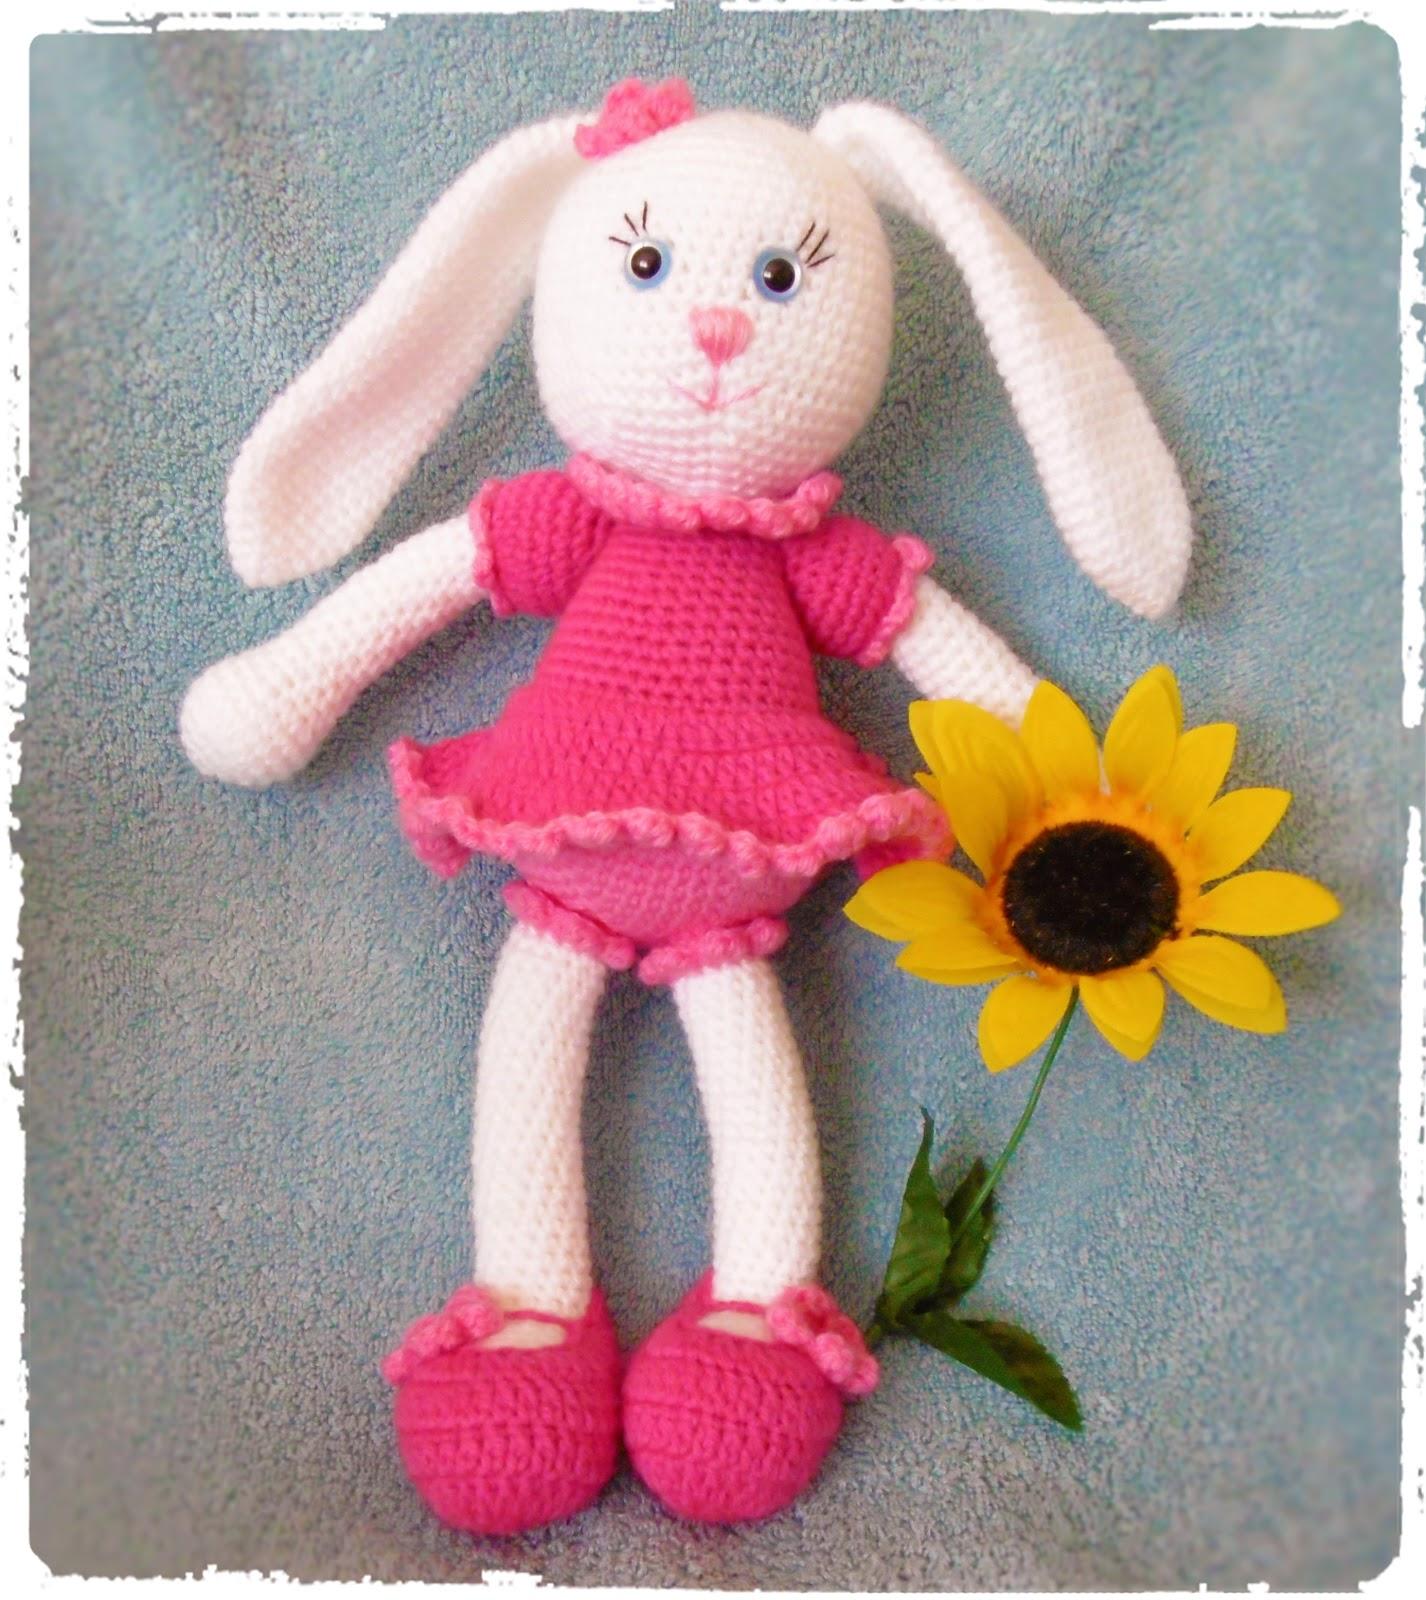 Amigurumi Janes : Kirju Mirju kasit??.: Amigurumi Jankud. Amigurumi Bunny.